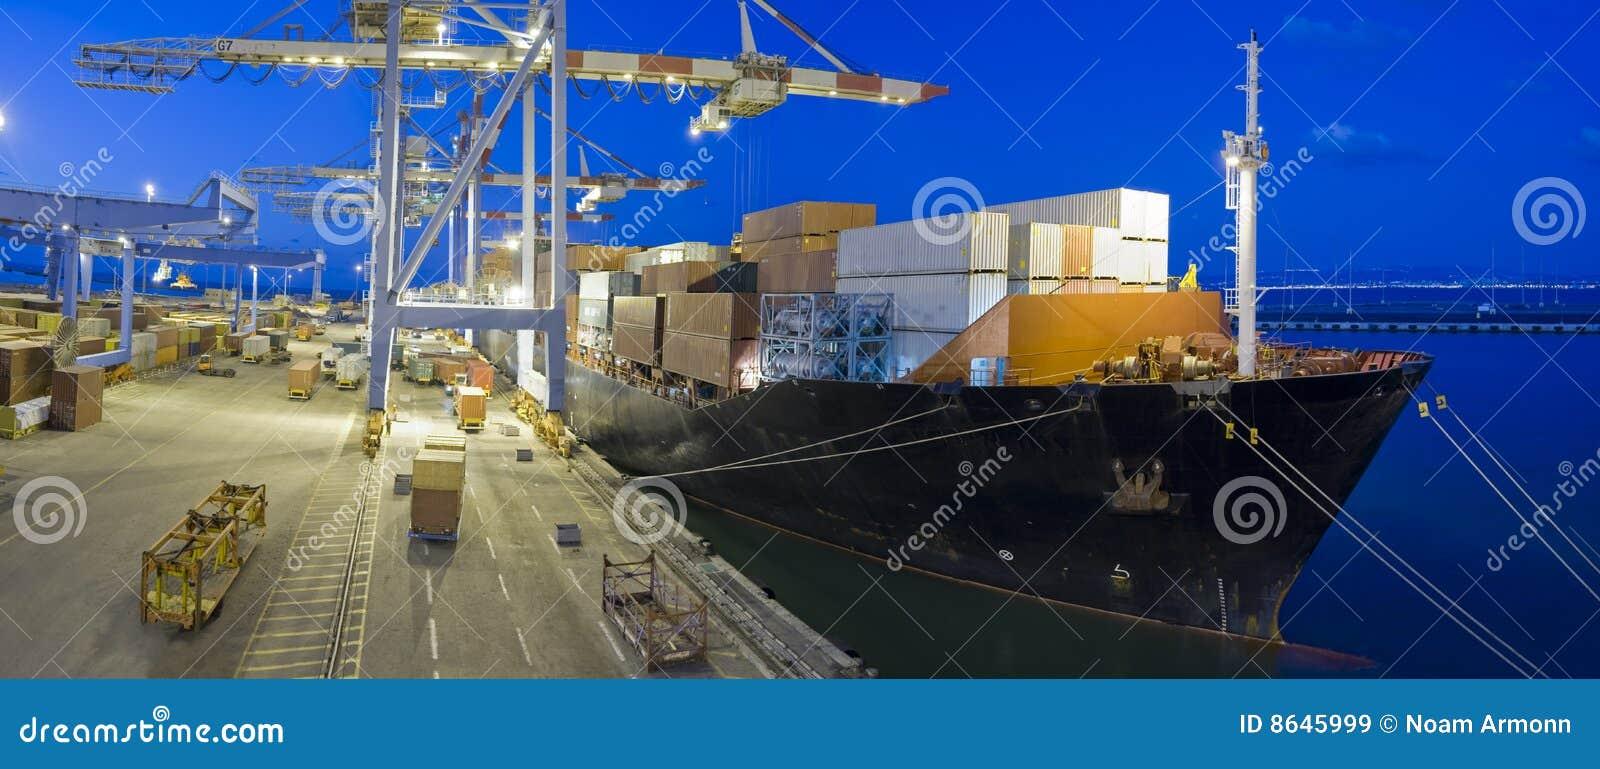 Cargo ship by night